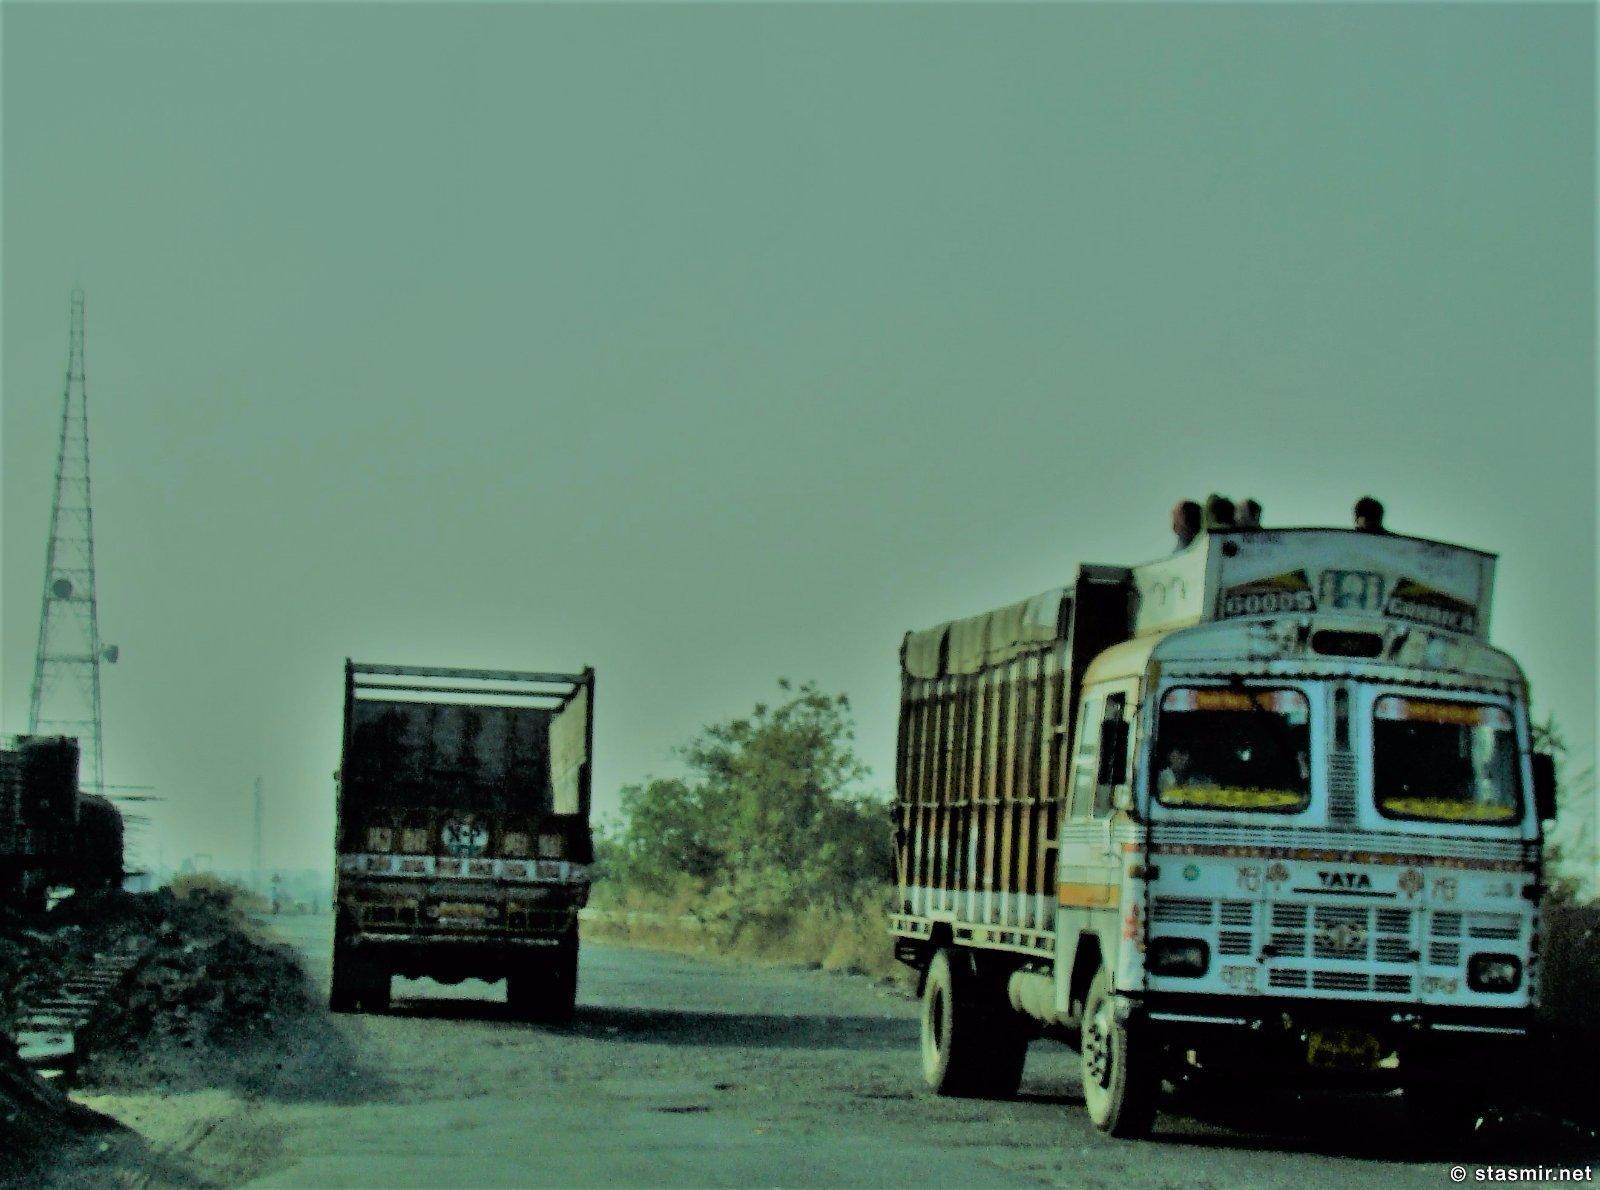 дороги штата Махараштра, Индия, Фото Стасмир, photo Stasmir